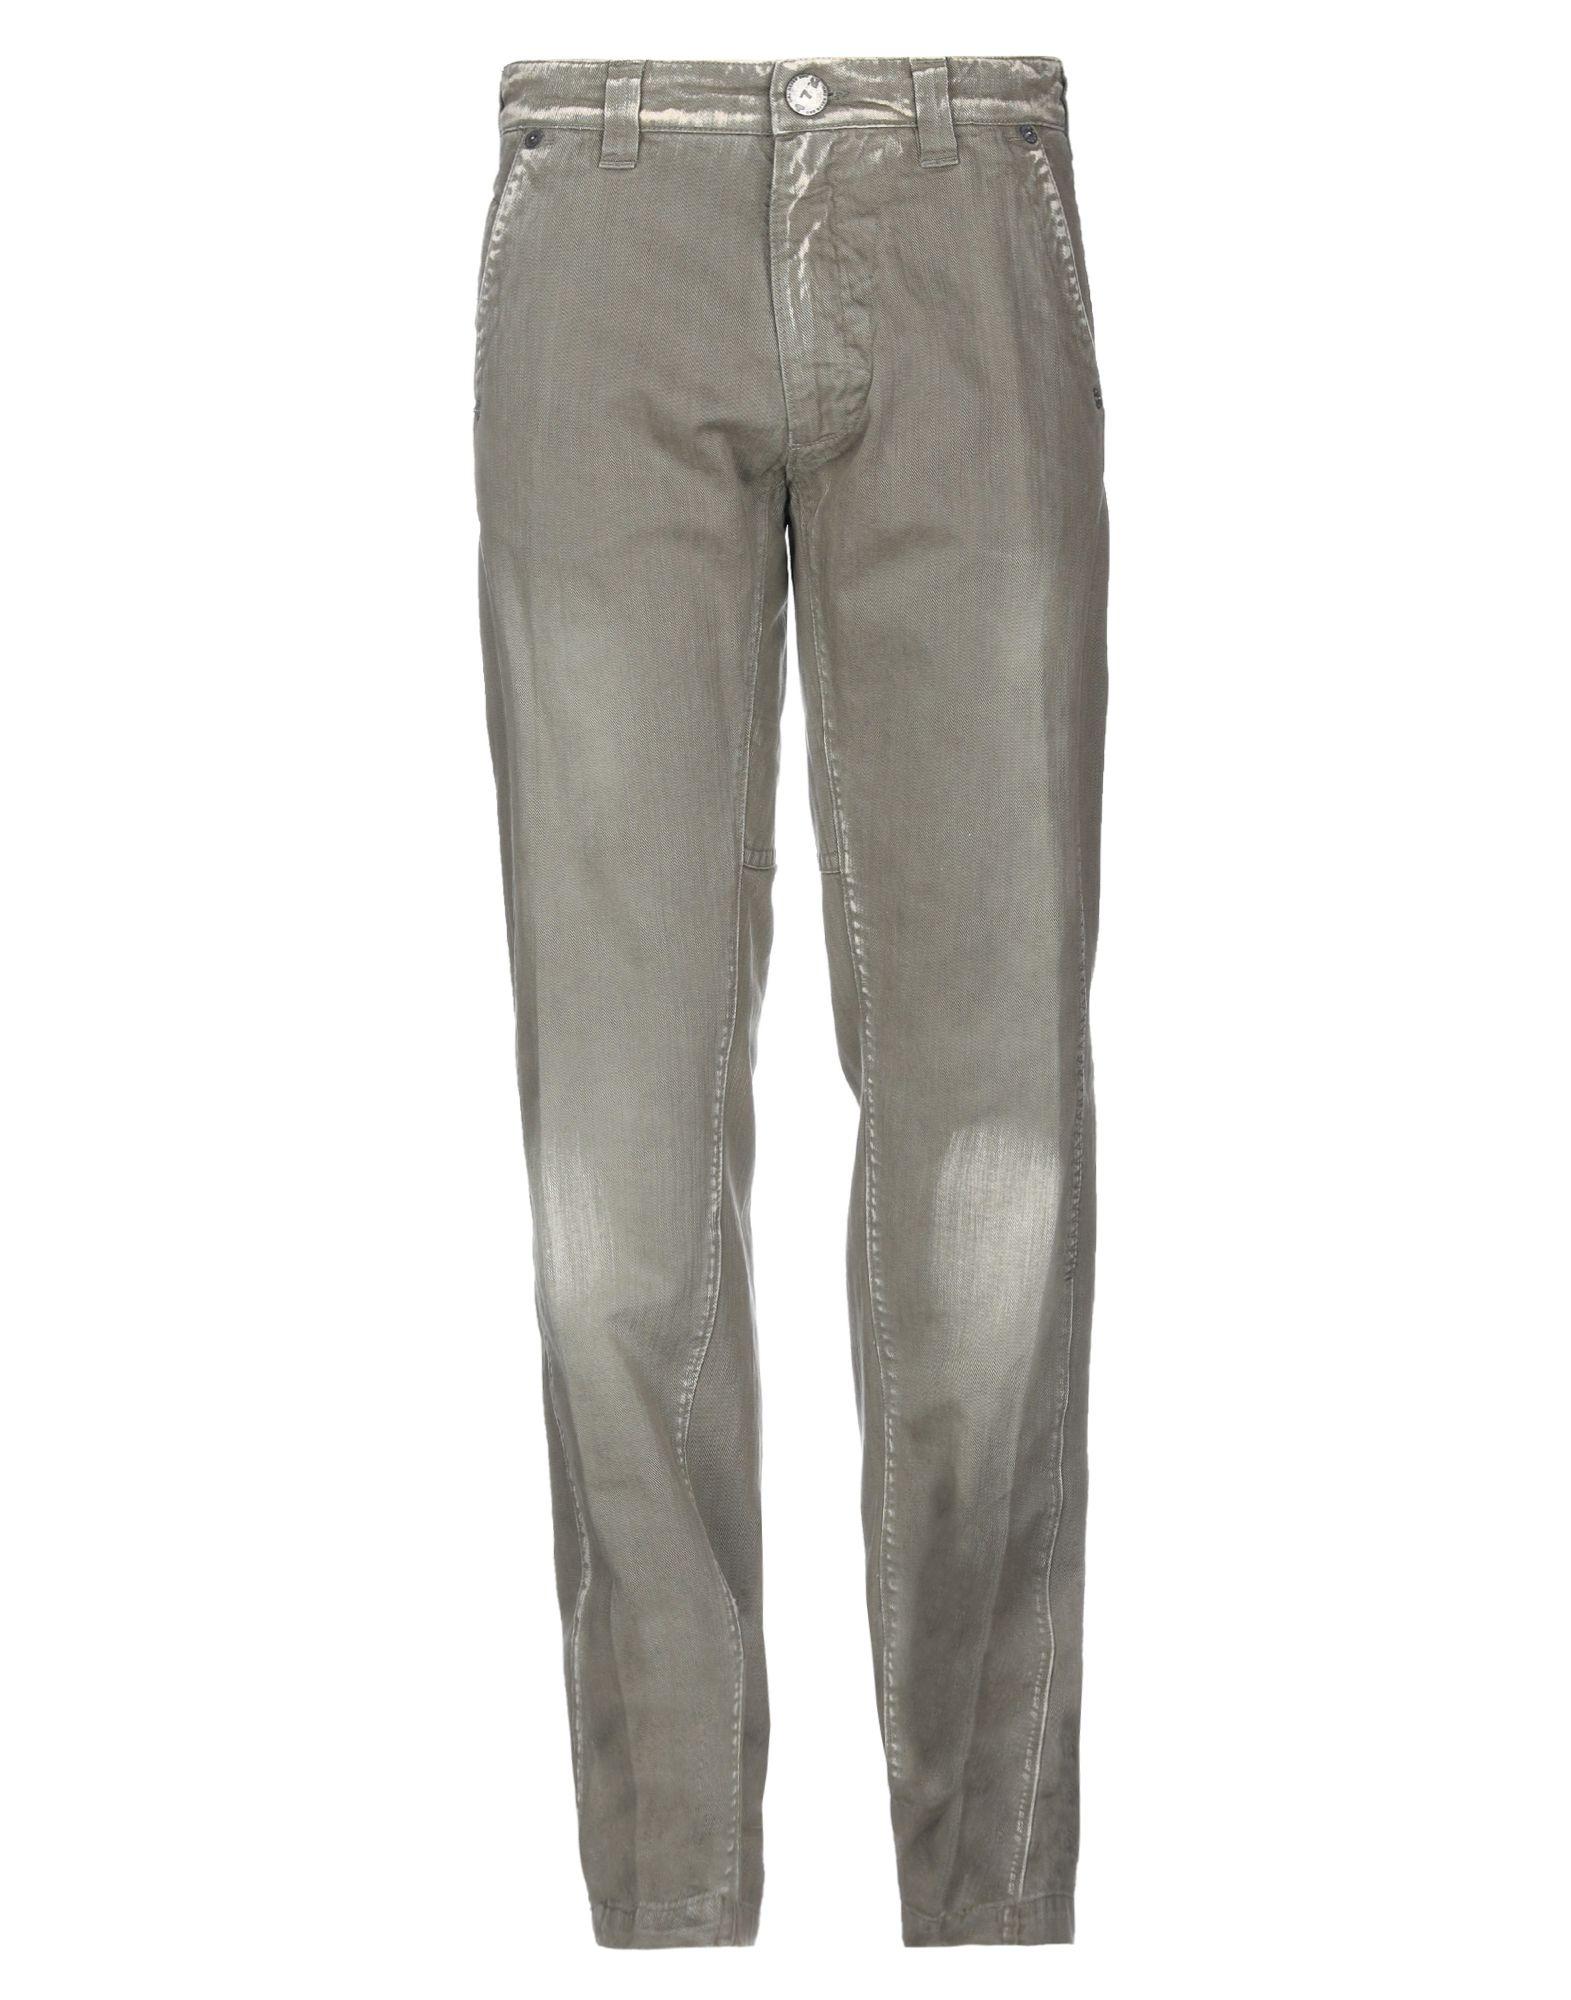 Фото - ONE SEVEN TWO Джинсовые брюки seven джинсовые брюки